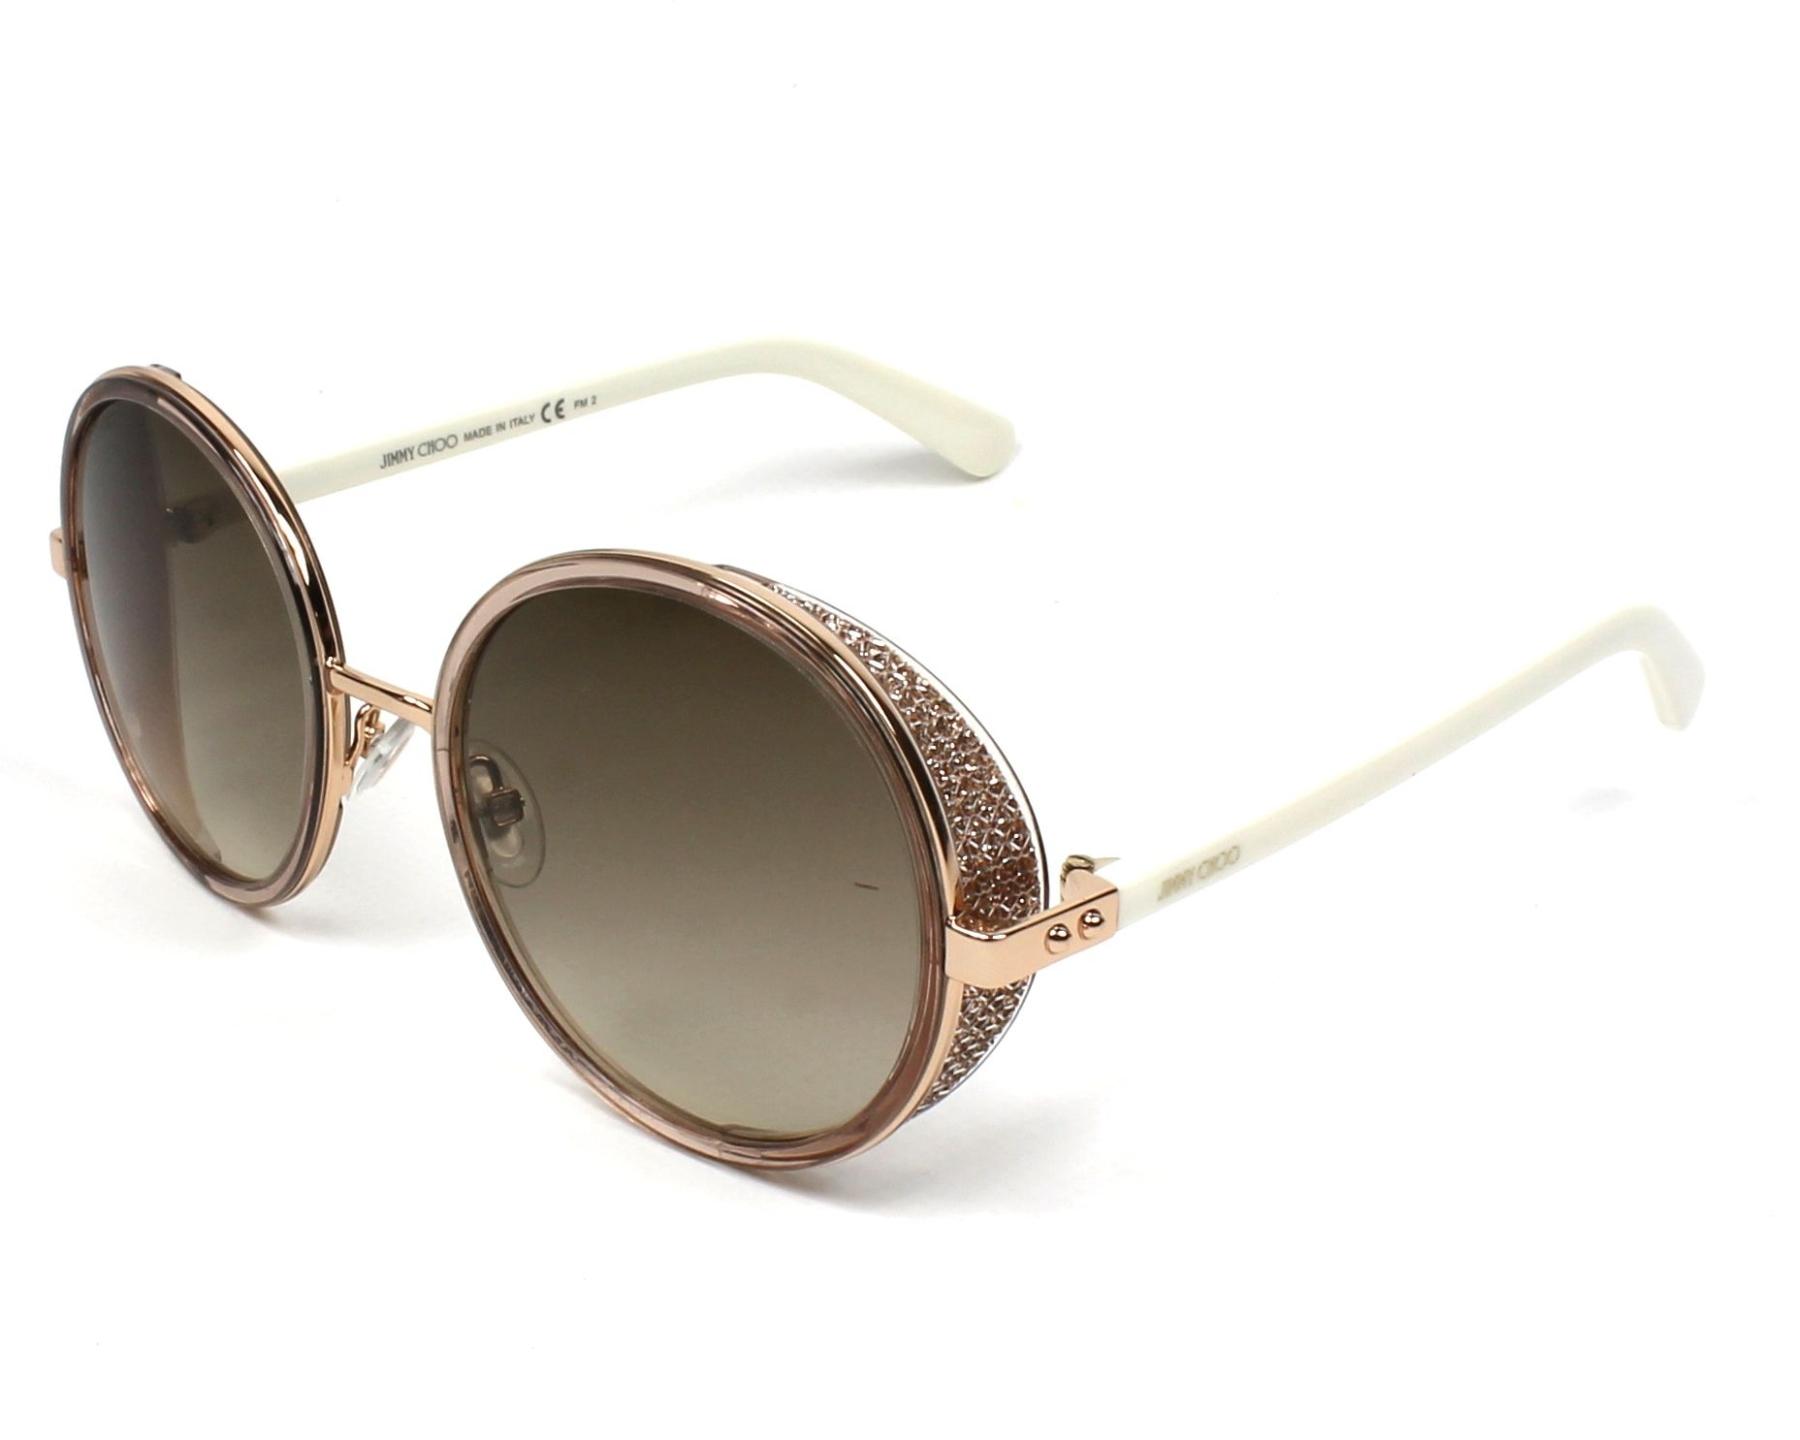 262f18607fe thumbnail Sunglasses Jimmy Choo ANDIE-N-S 1KH CC - Beige Silver profile view